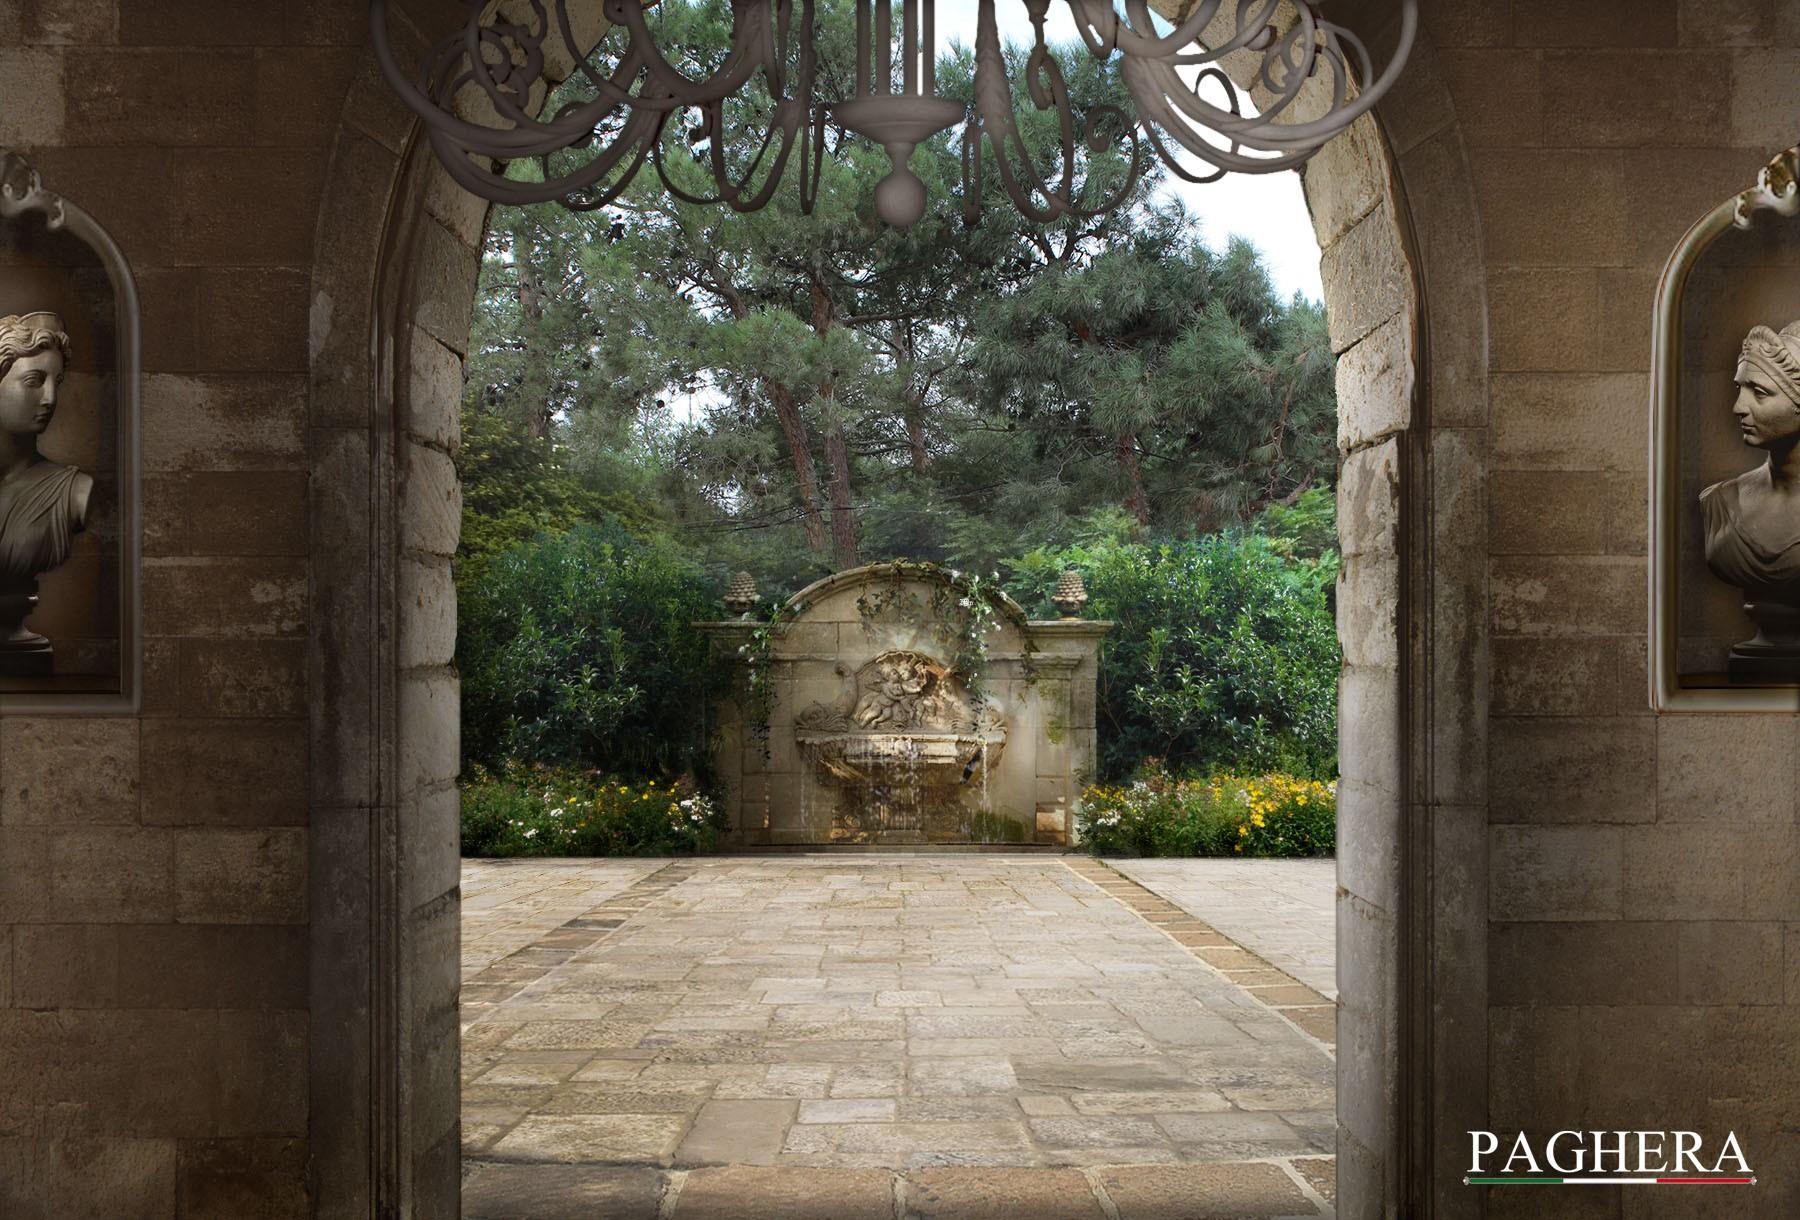 Old-fashioned Villa - Gardens